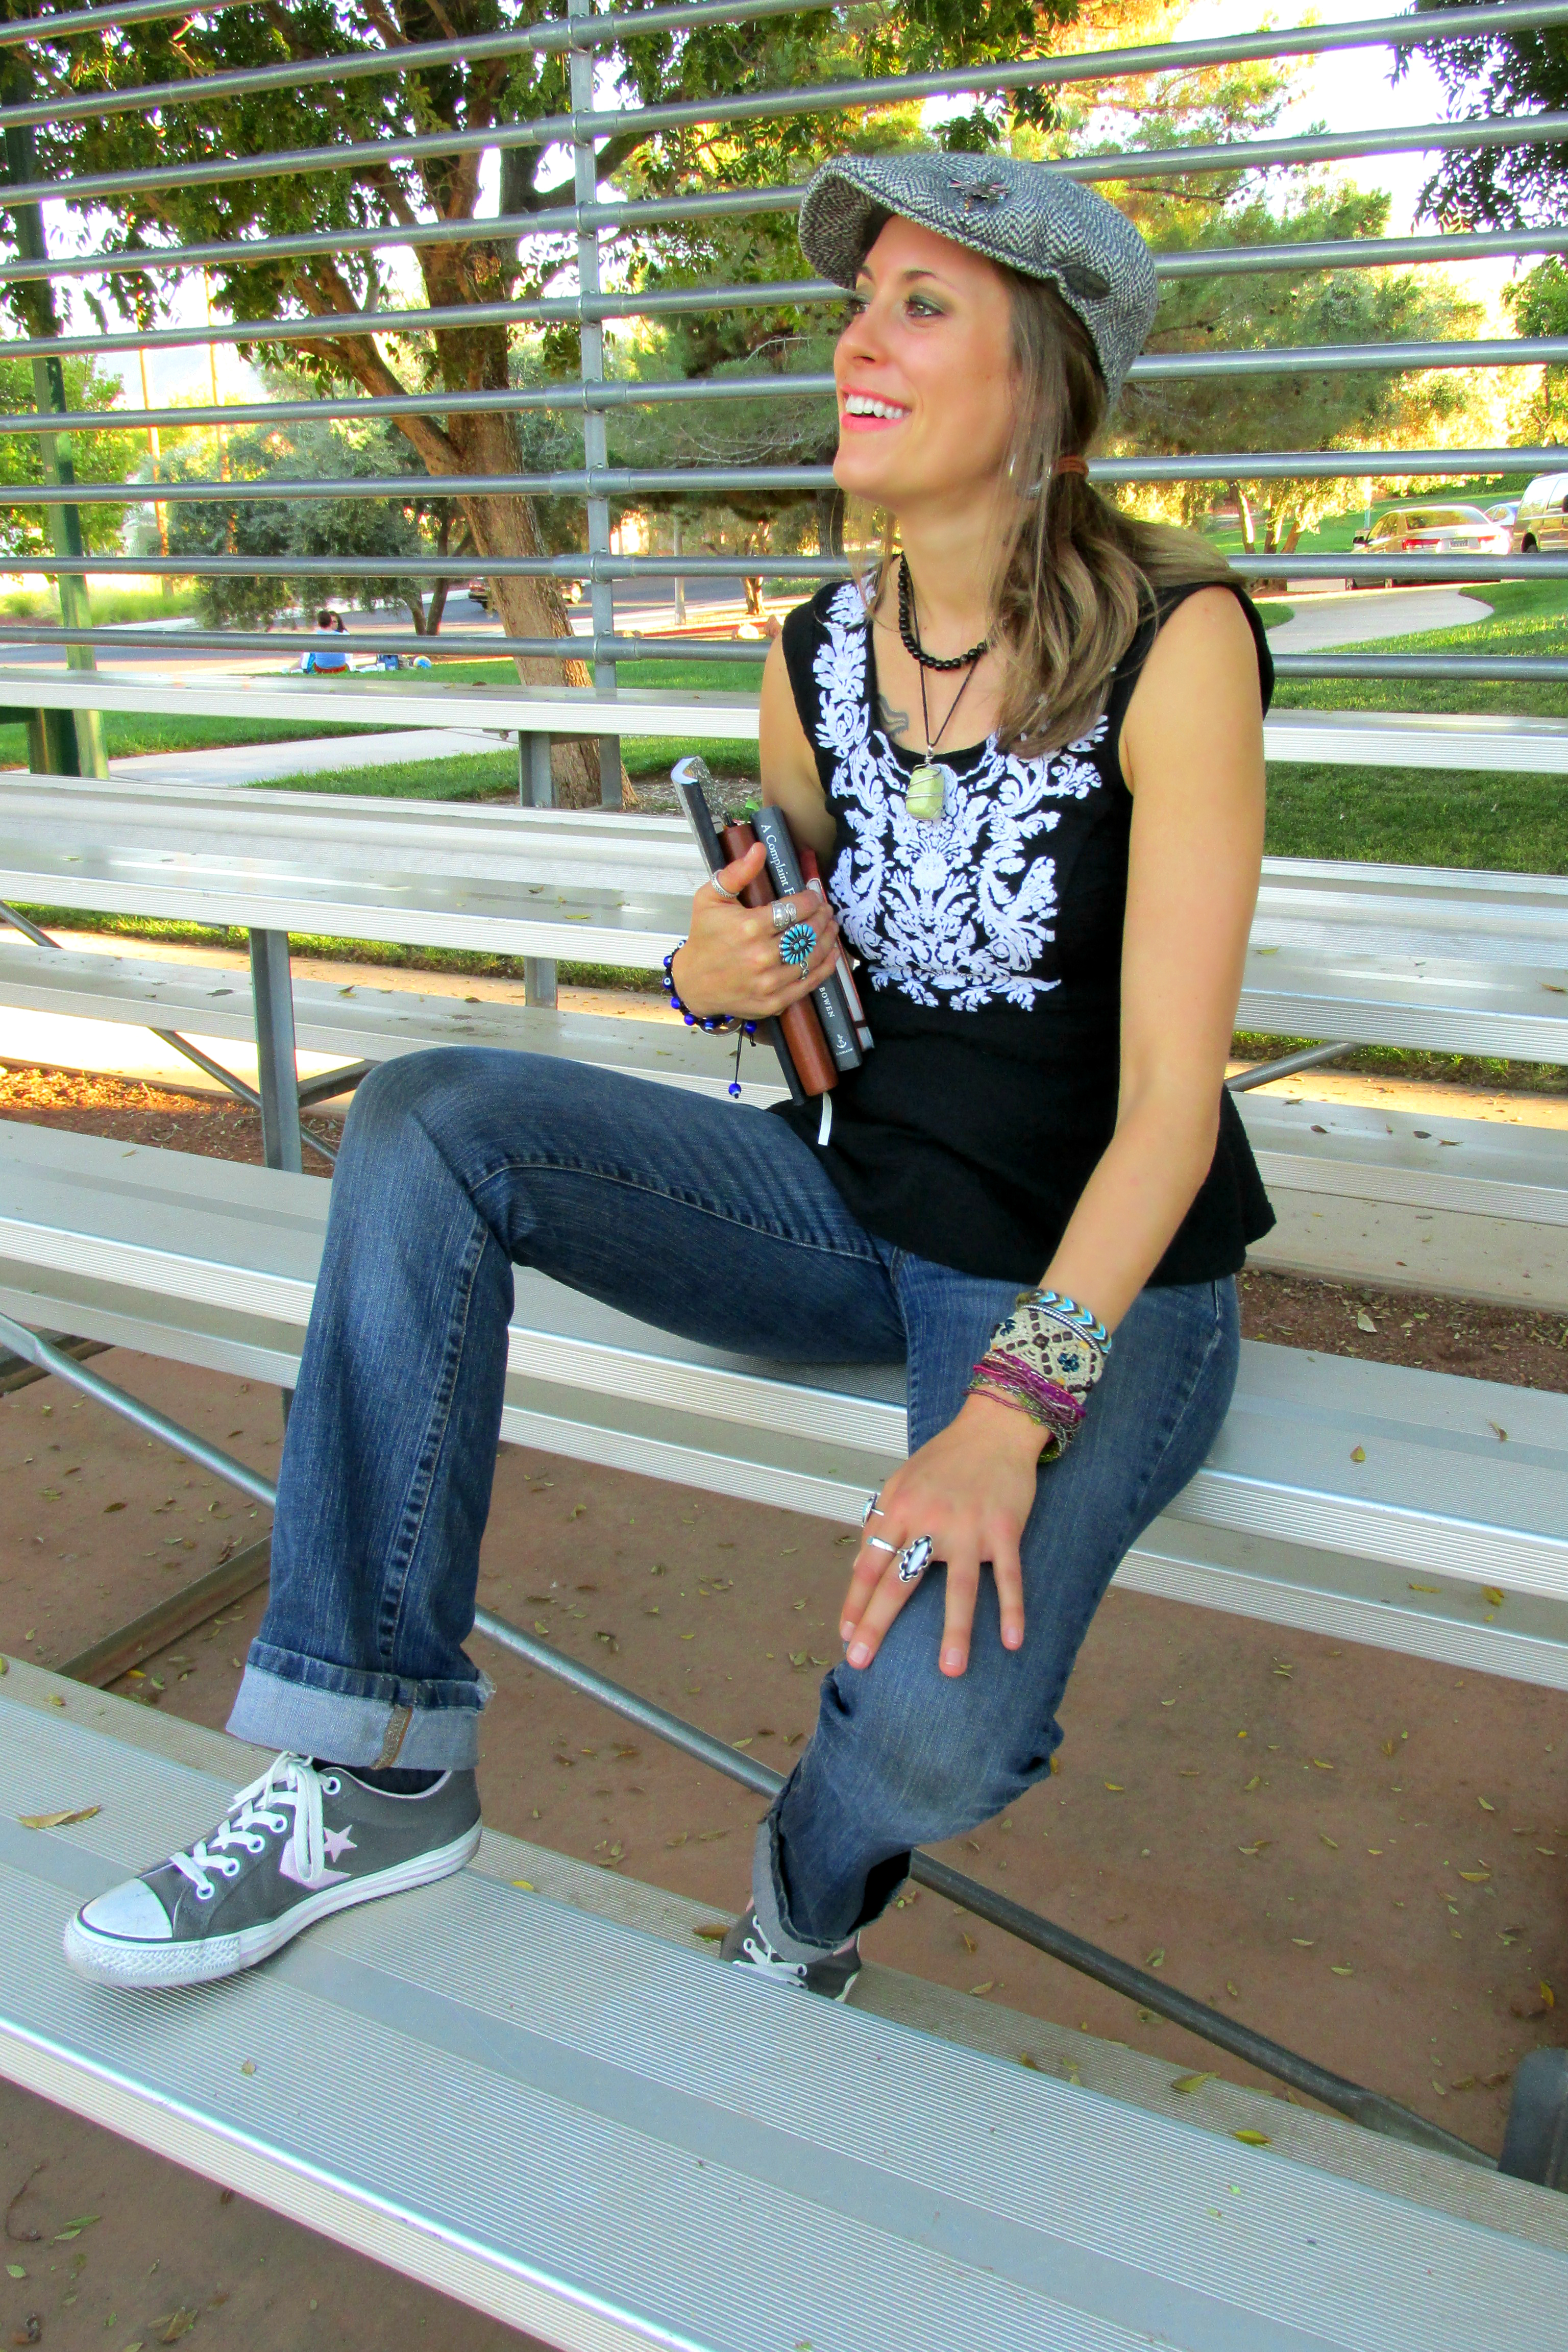 Elyse Hughes Micro Blogger